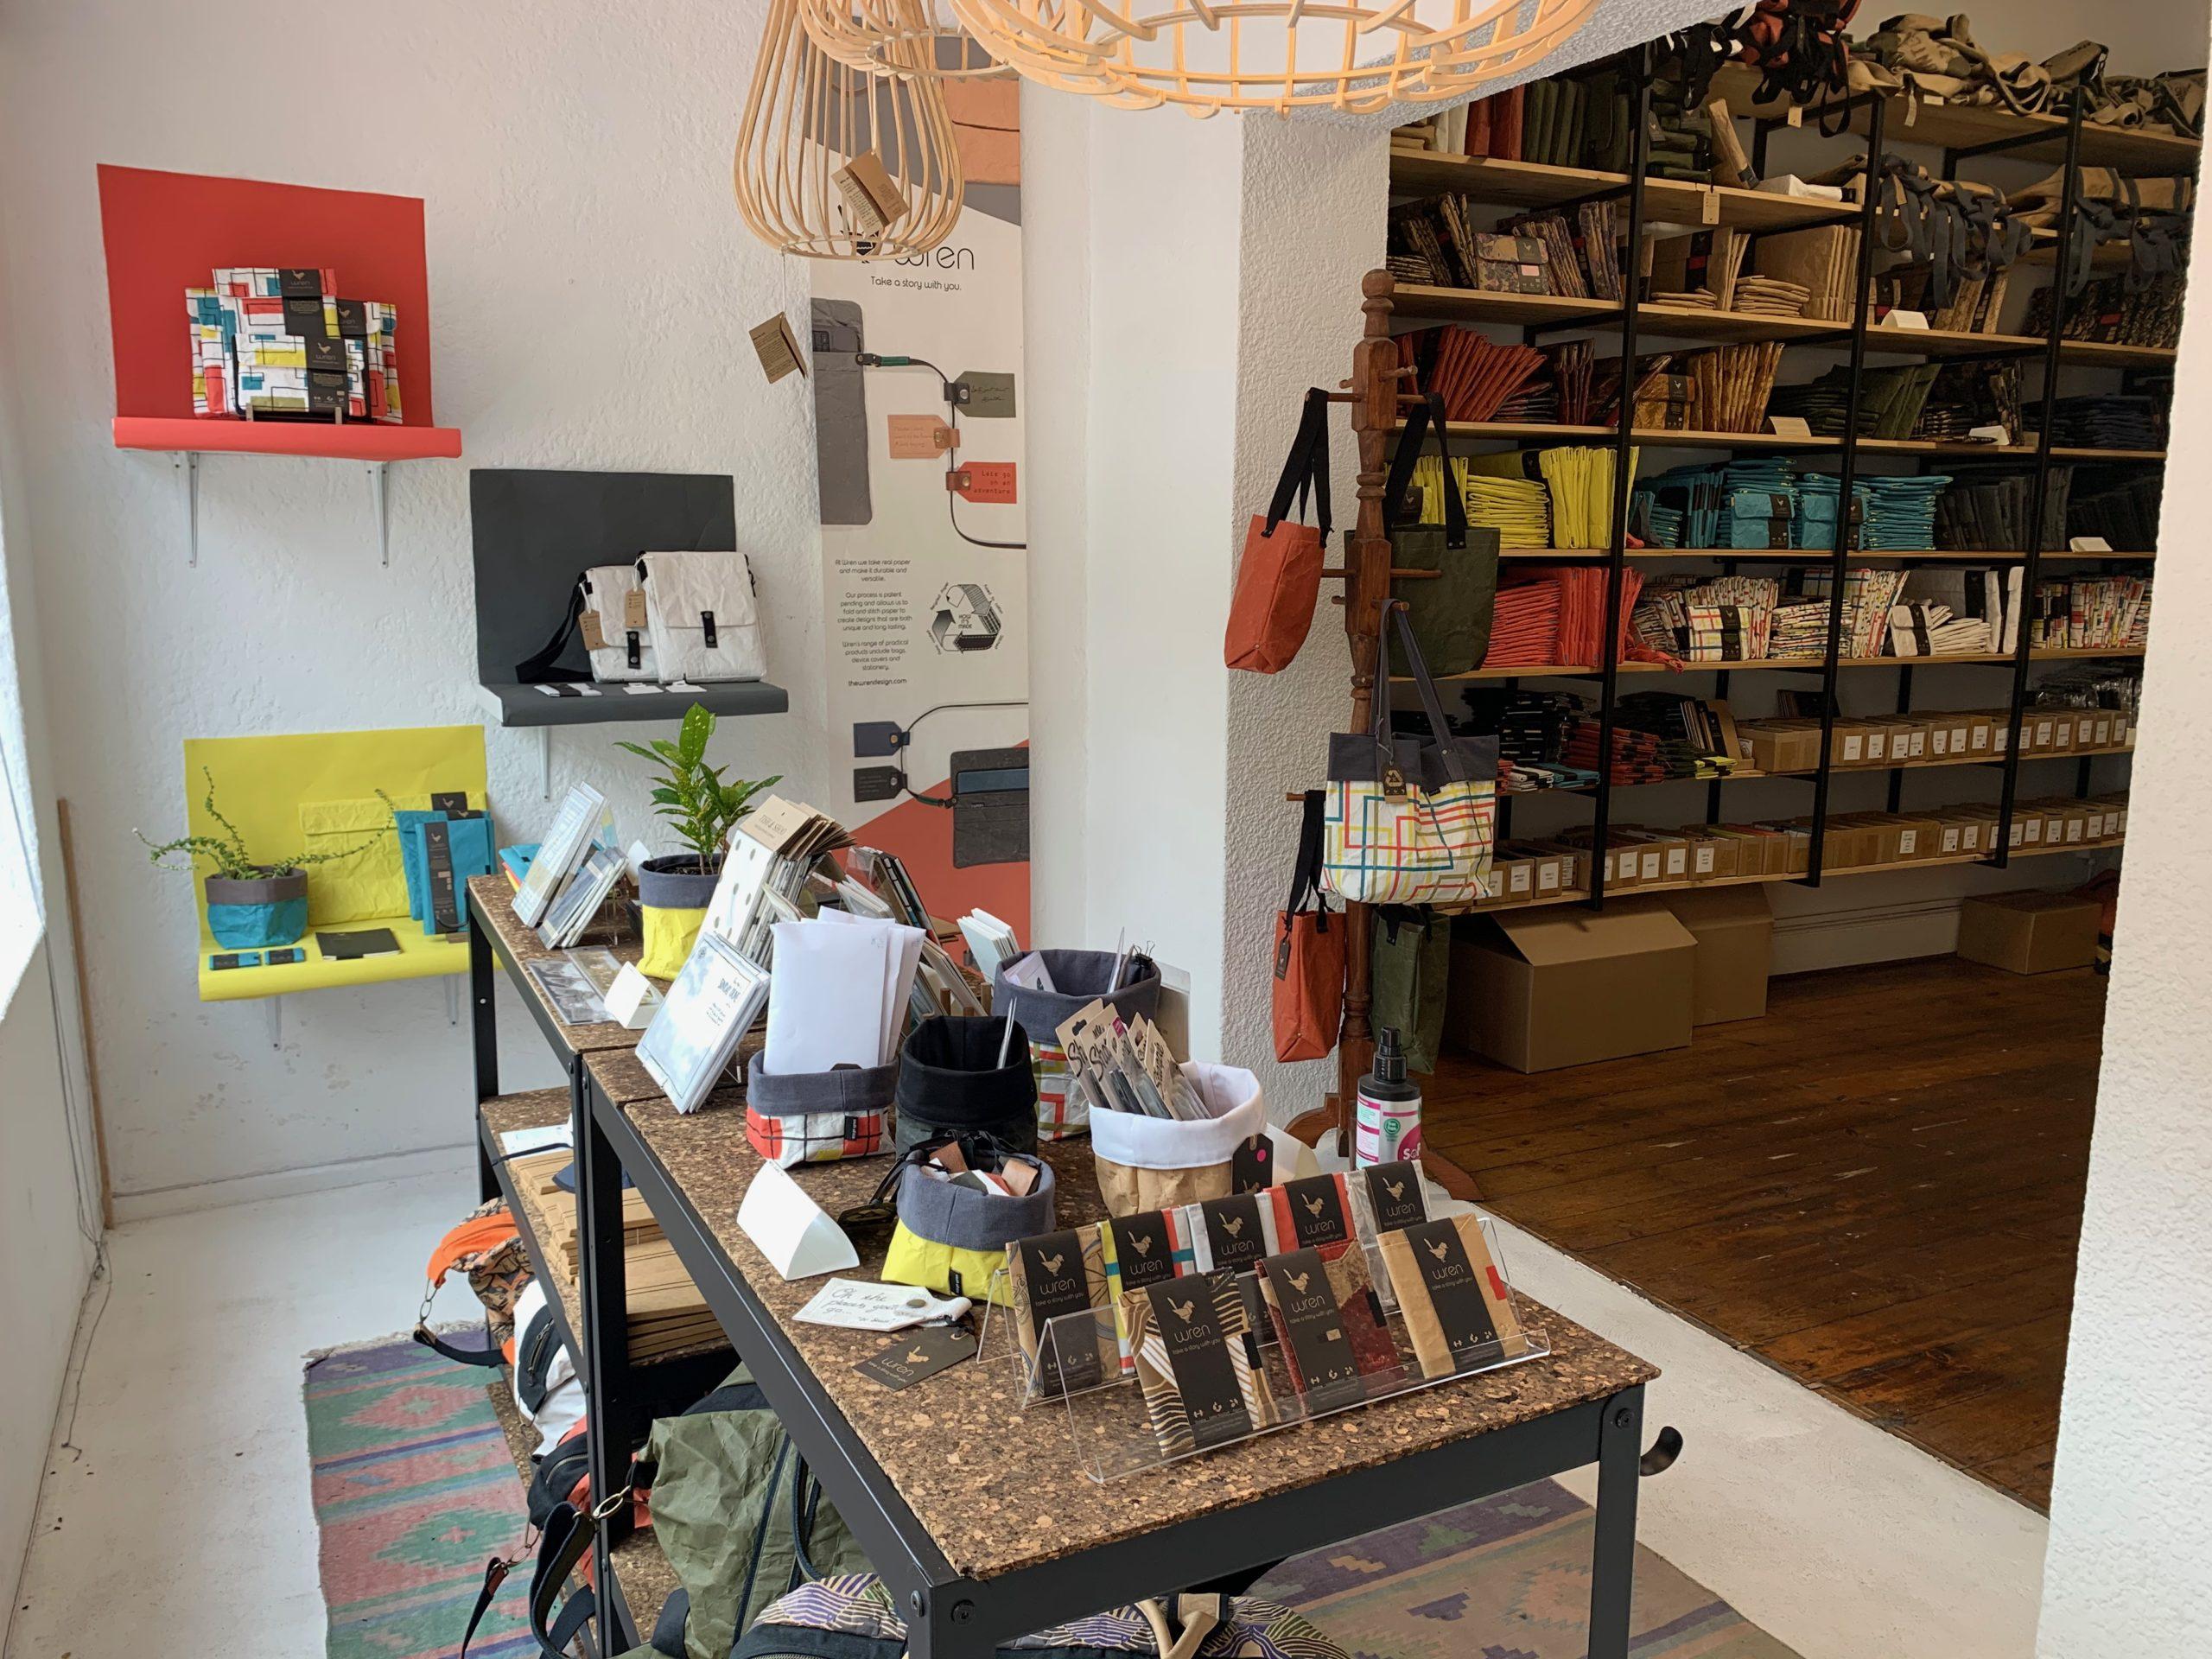 Wren creative studio and workshop